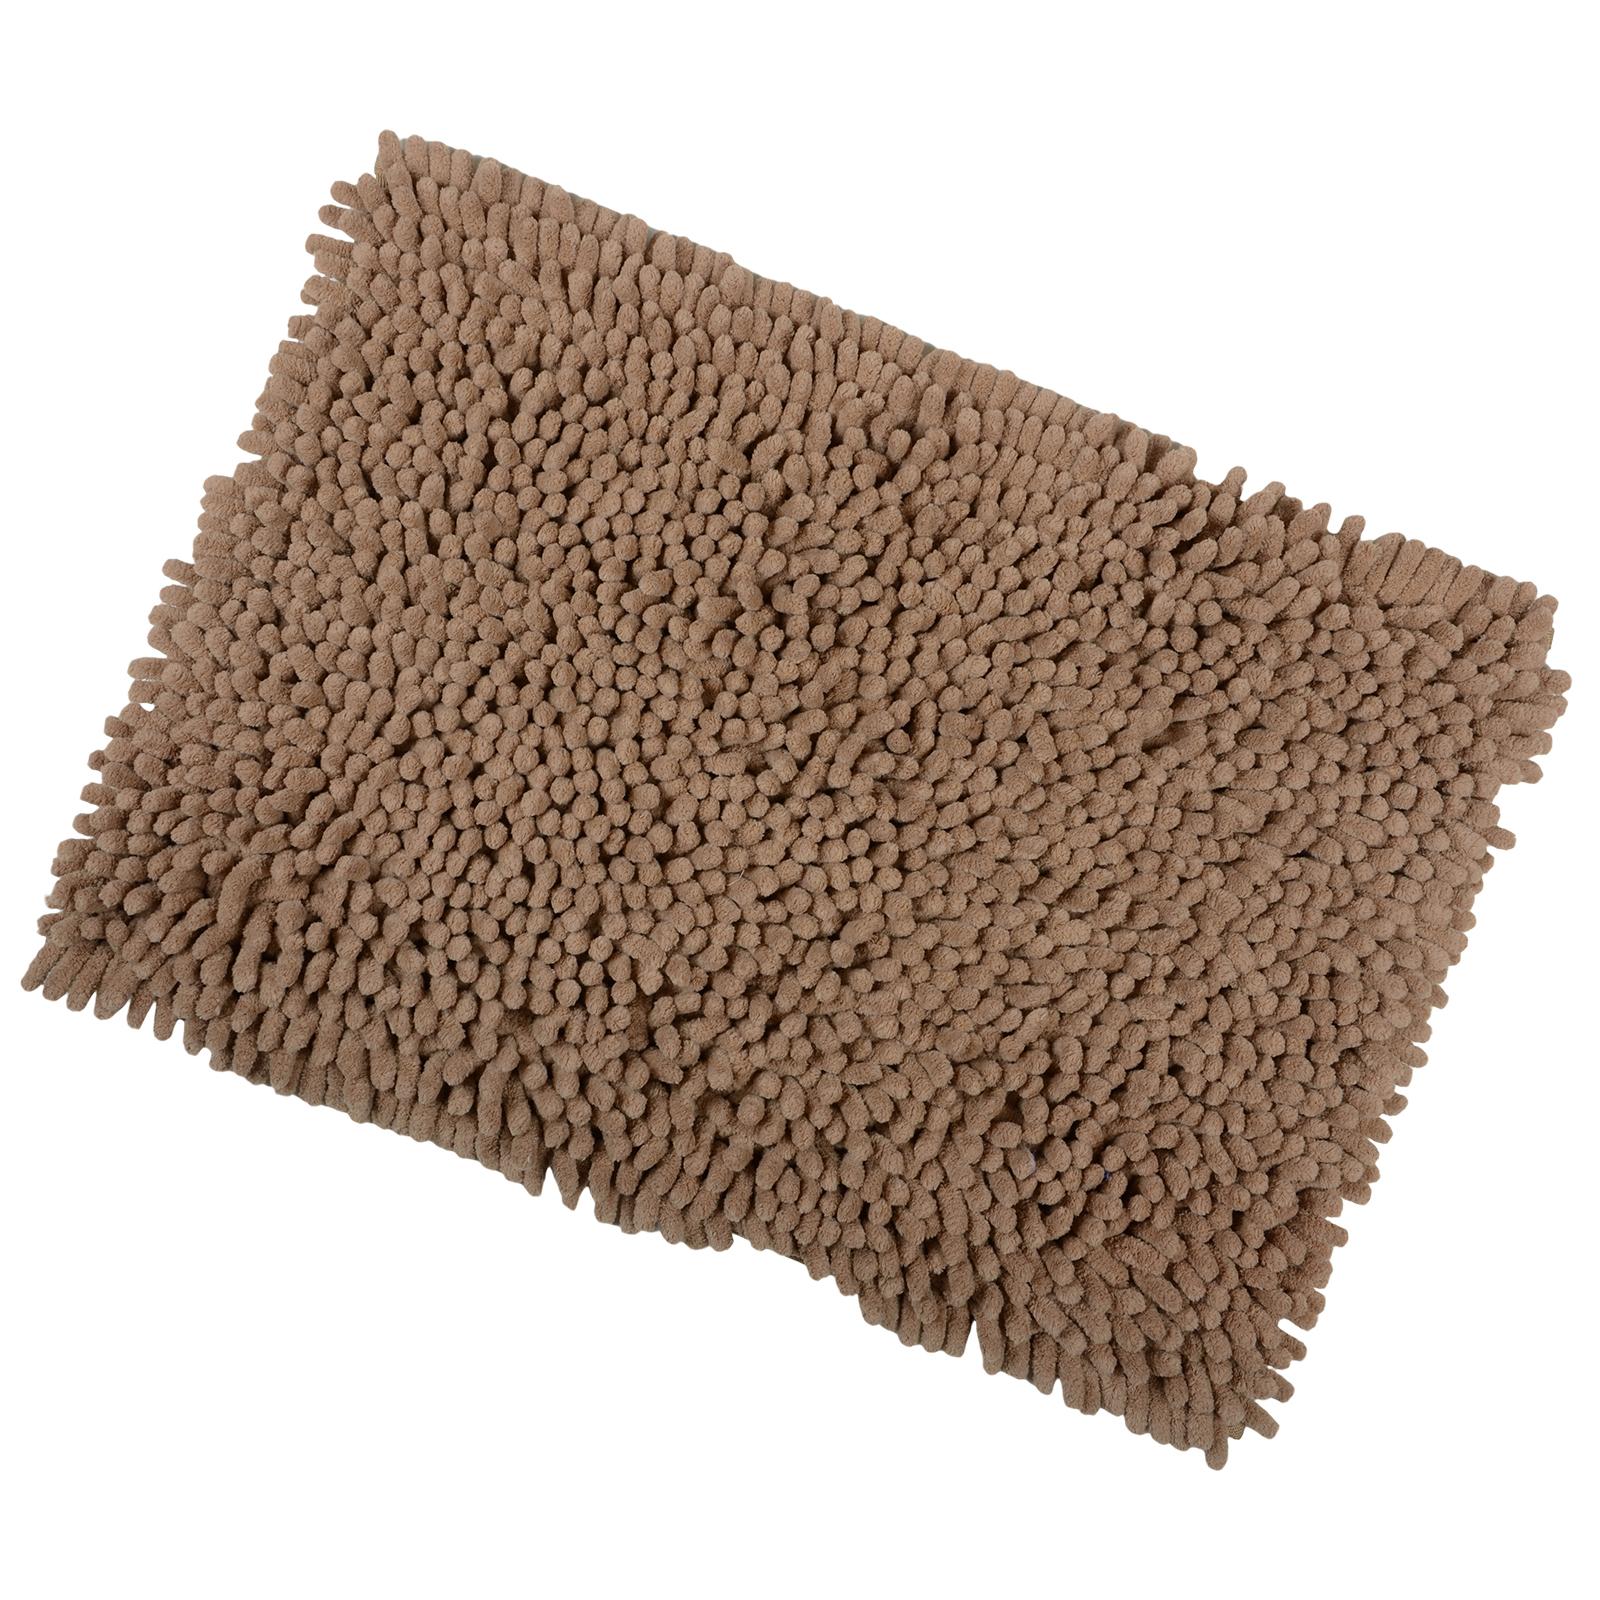 shaggy microfibre bathroom shower bath mat rug non slip backing 12 colours ebay. Black Bedroom Furniture Sets. Home Design Ideas